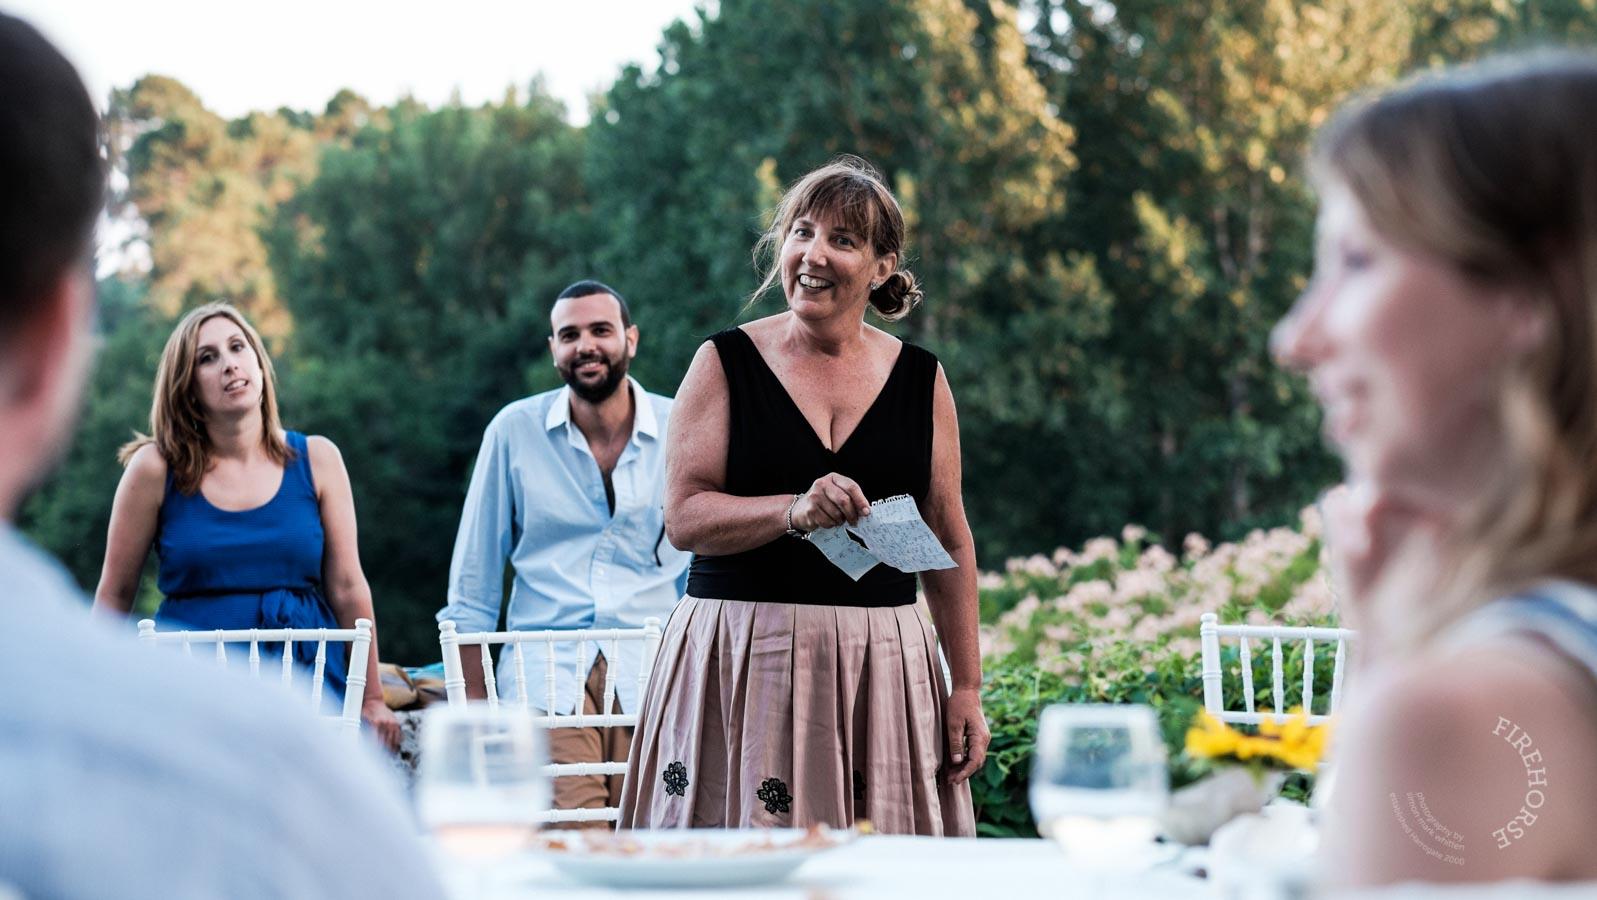 Lot-et-Garonne-Wedding-Photography-096